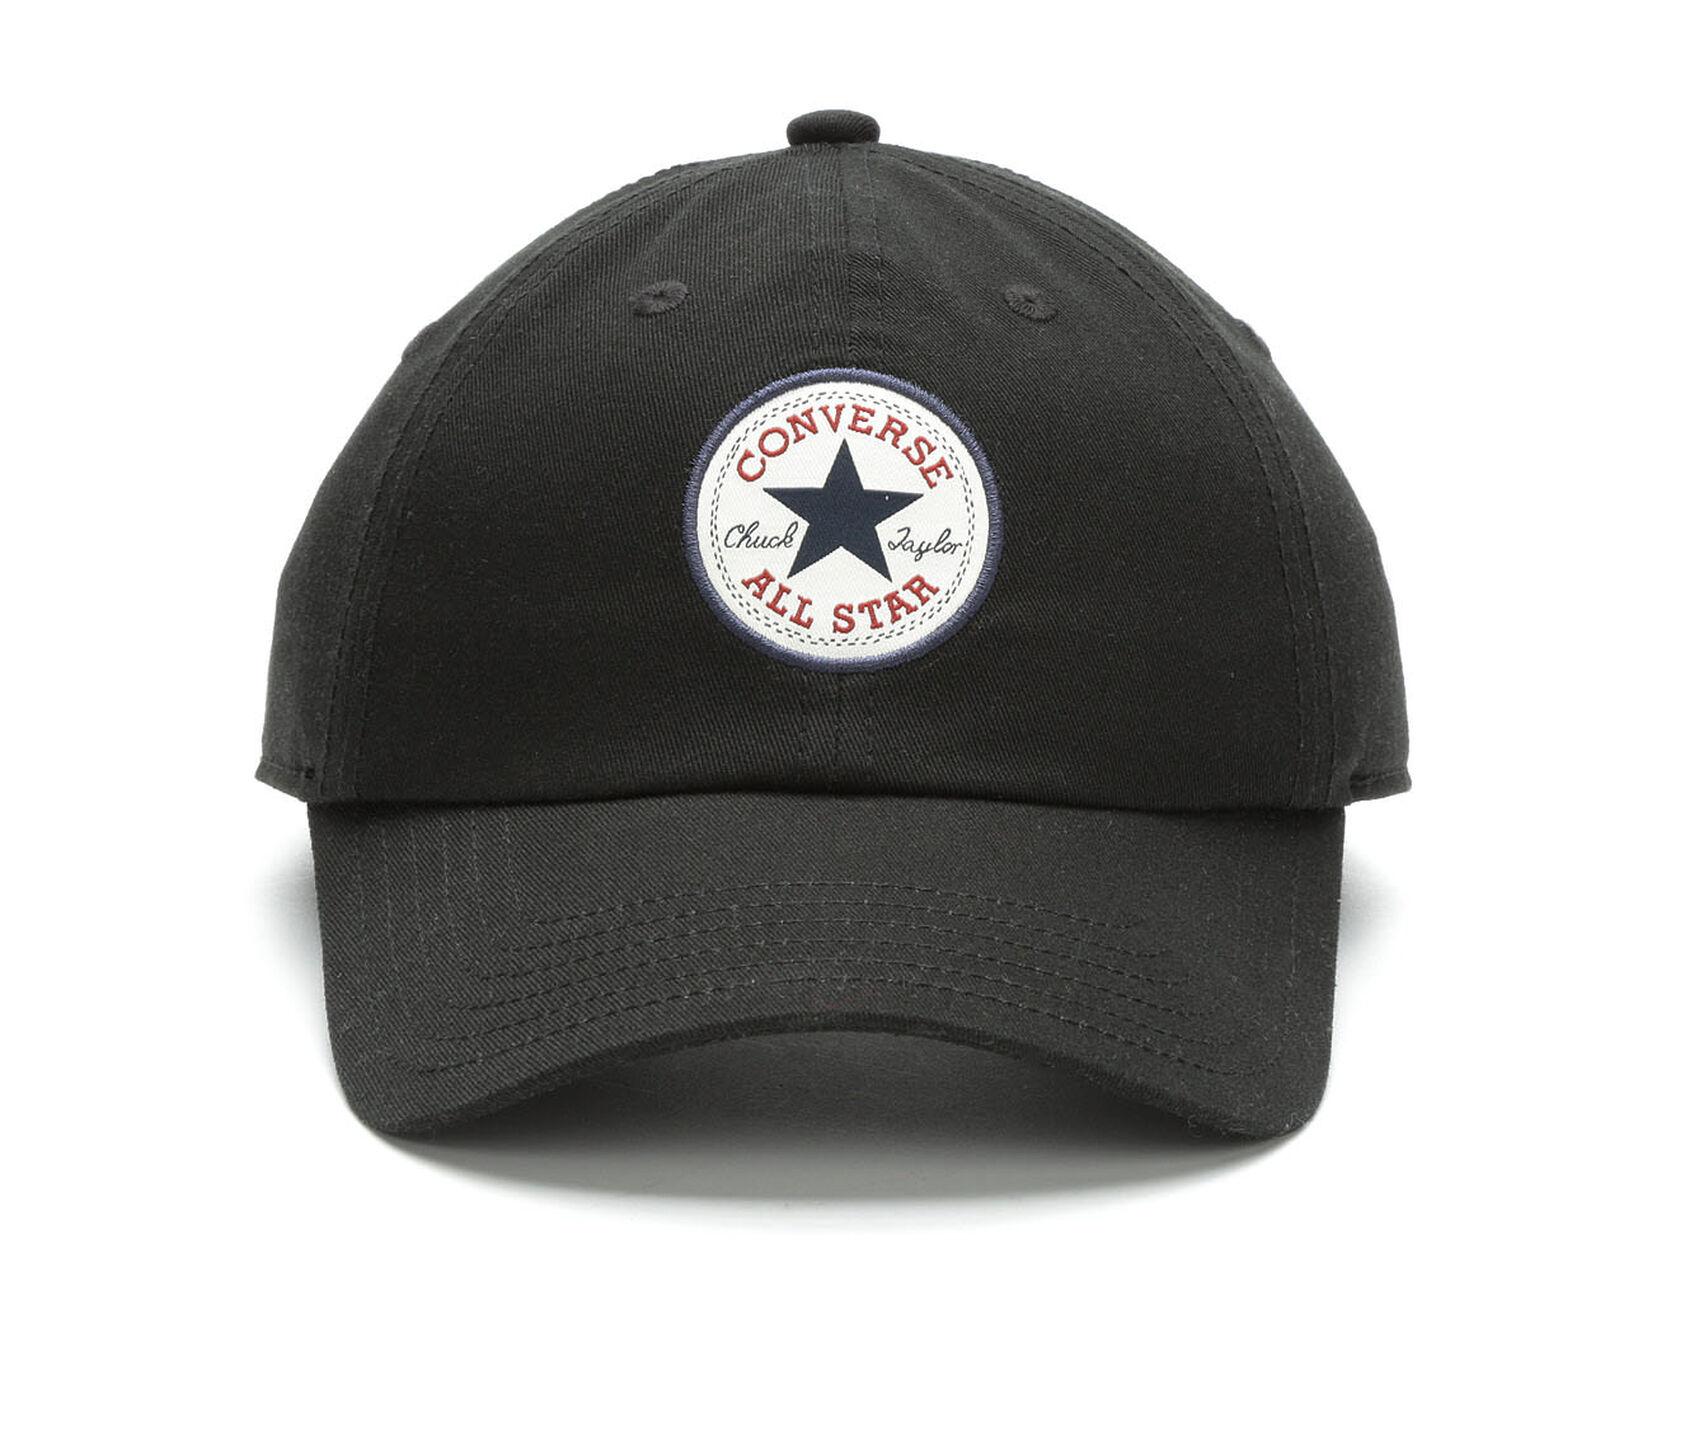 aefe6cd61d3 Converse Core Classic Twill Baseball Cap. Previous